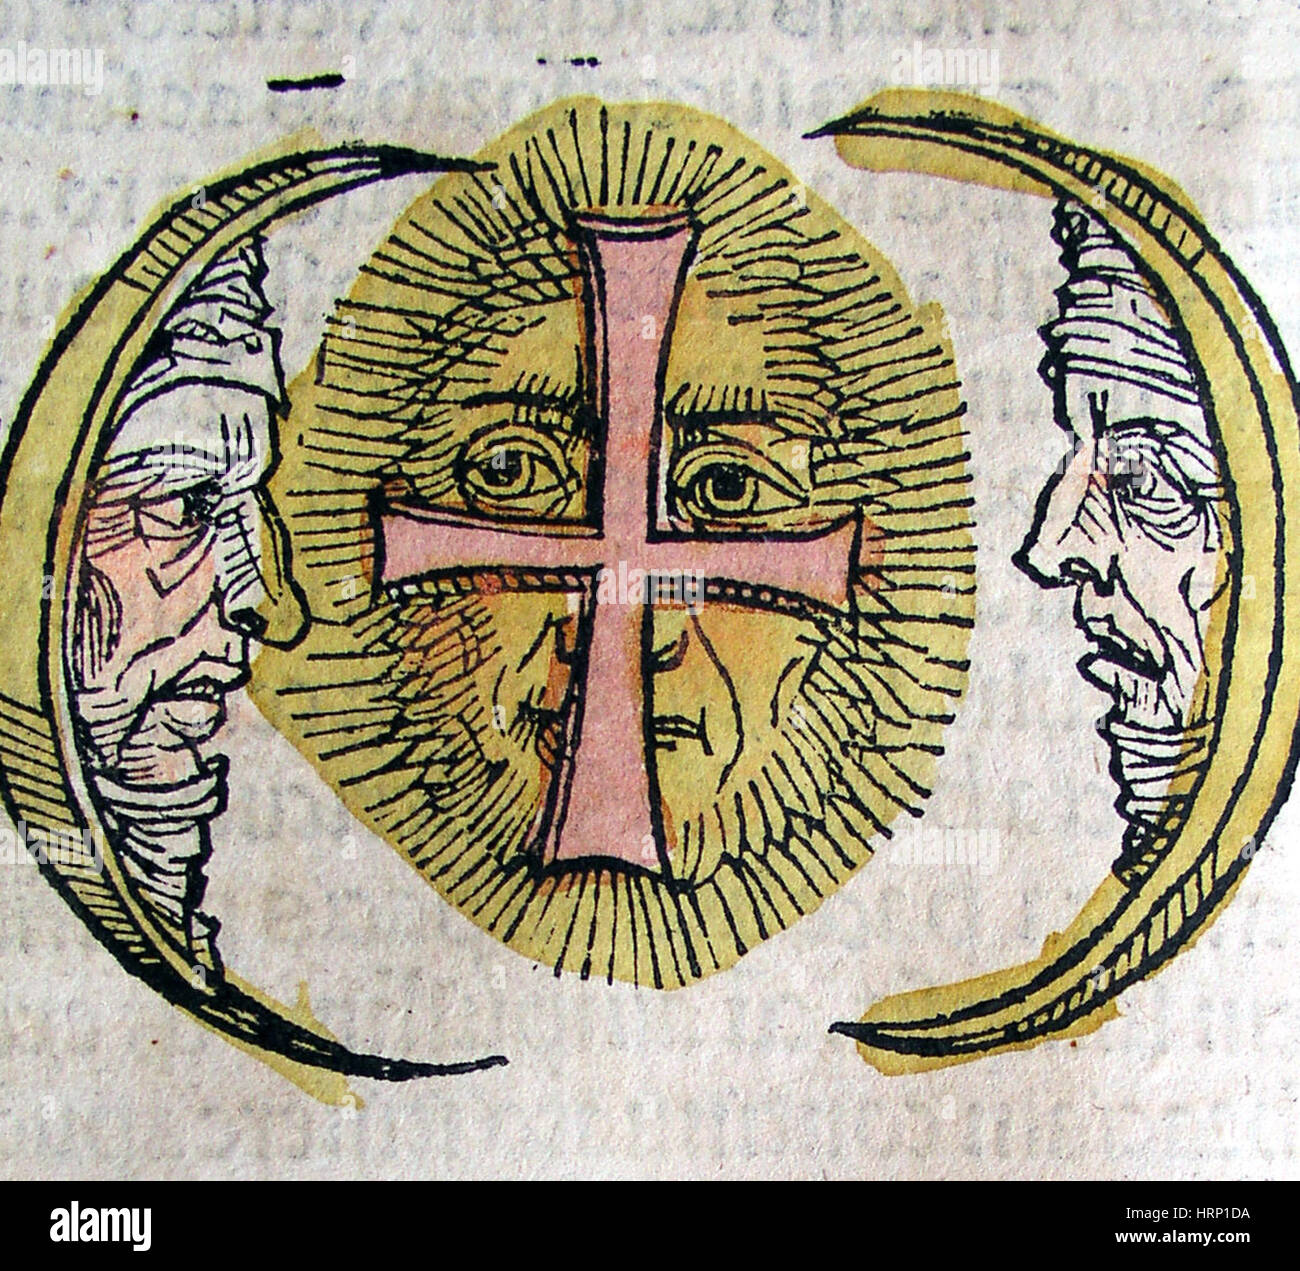 Three Moons, Nuremberg Chronicle, 1493 - Stock Image